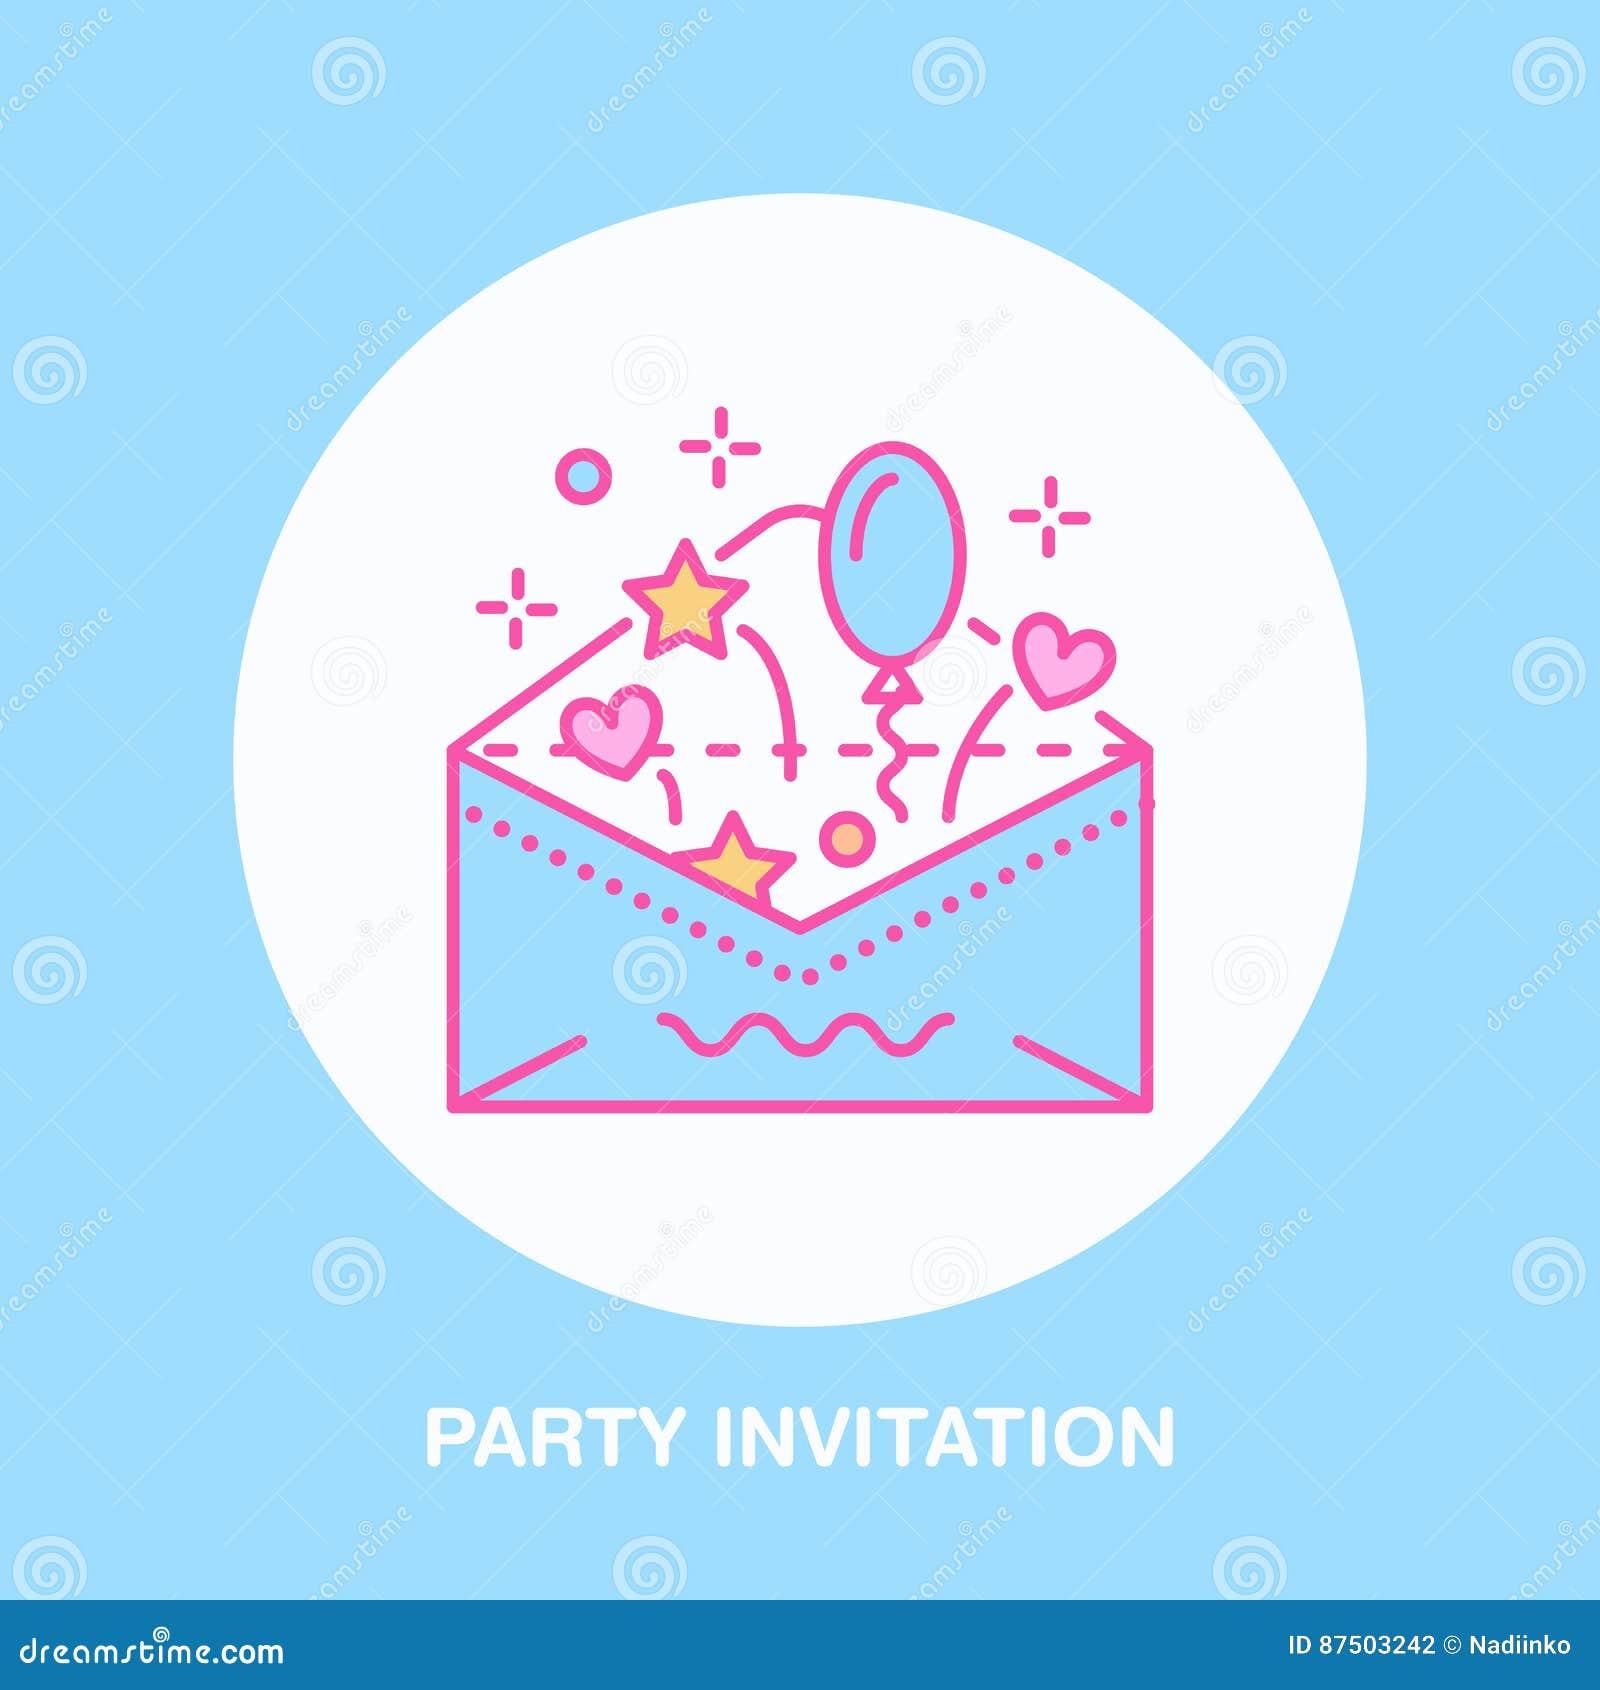 Birthday party invitation line icon vector logo for party service birthday party invitation line icon vector logo for party service or event agency linear illustration of wedding stock vector illustration of celebrate stopboris Images